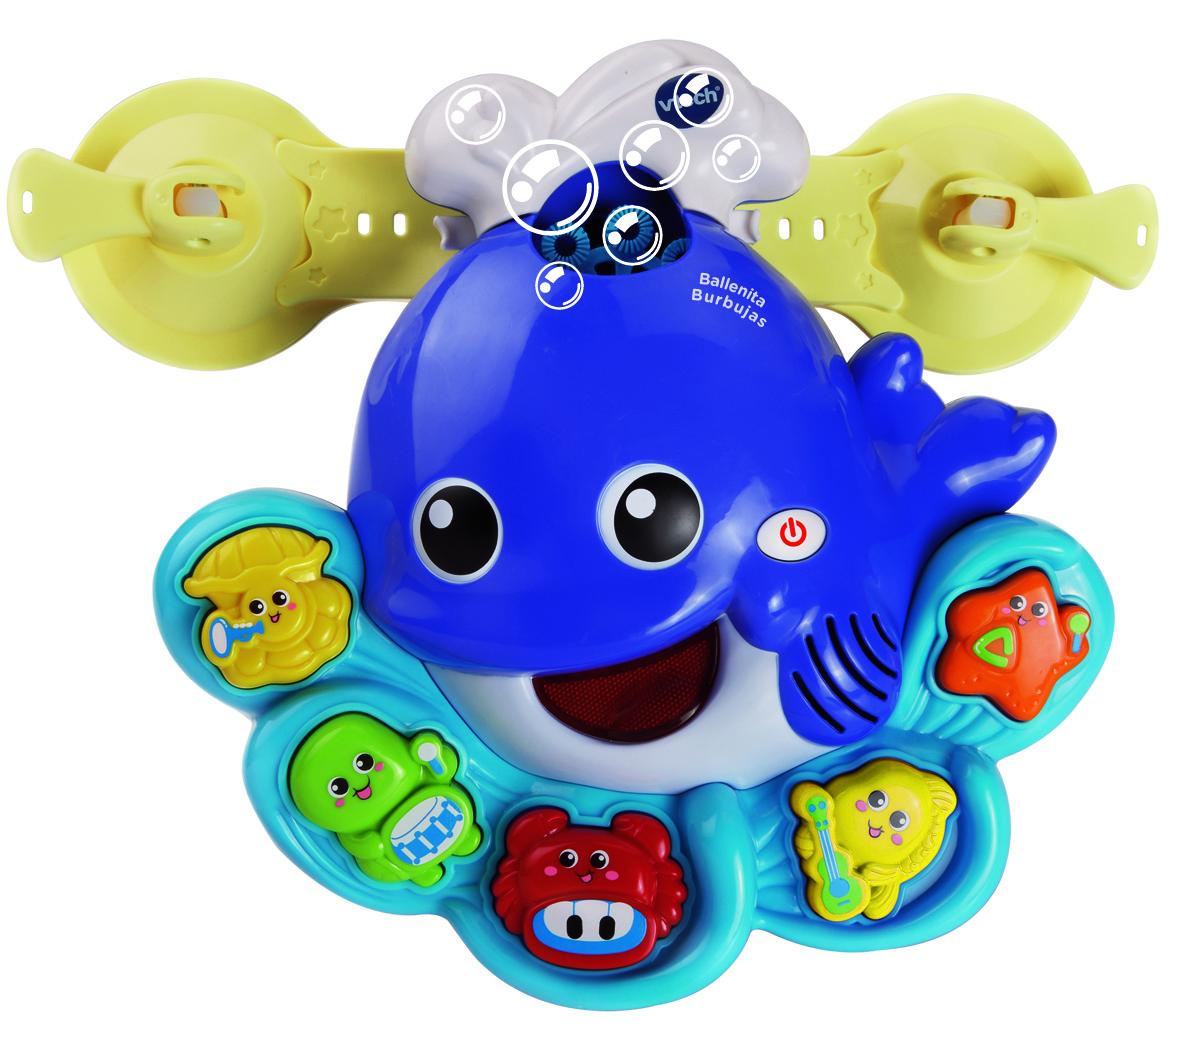 Cancion Infantil Baño De Burbujas:Estos juguetes de VTech están pensados para niños de entre 6 meses a